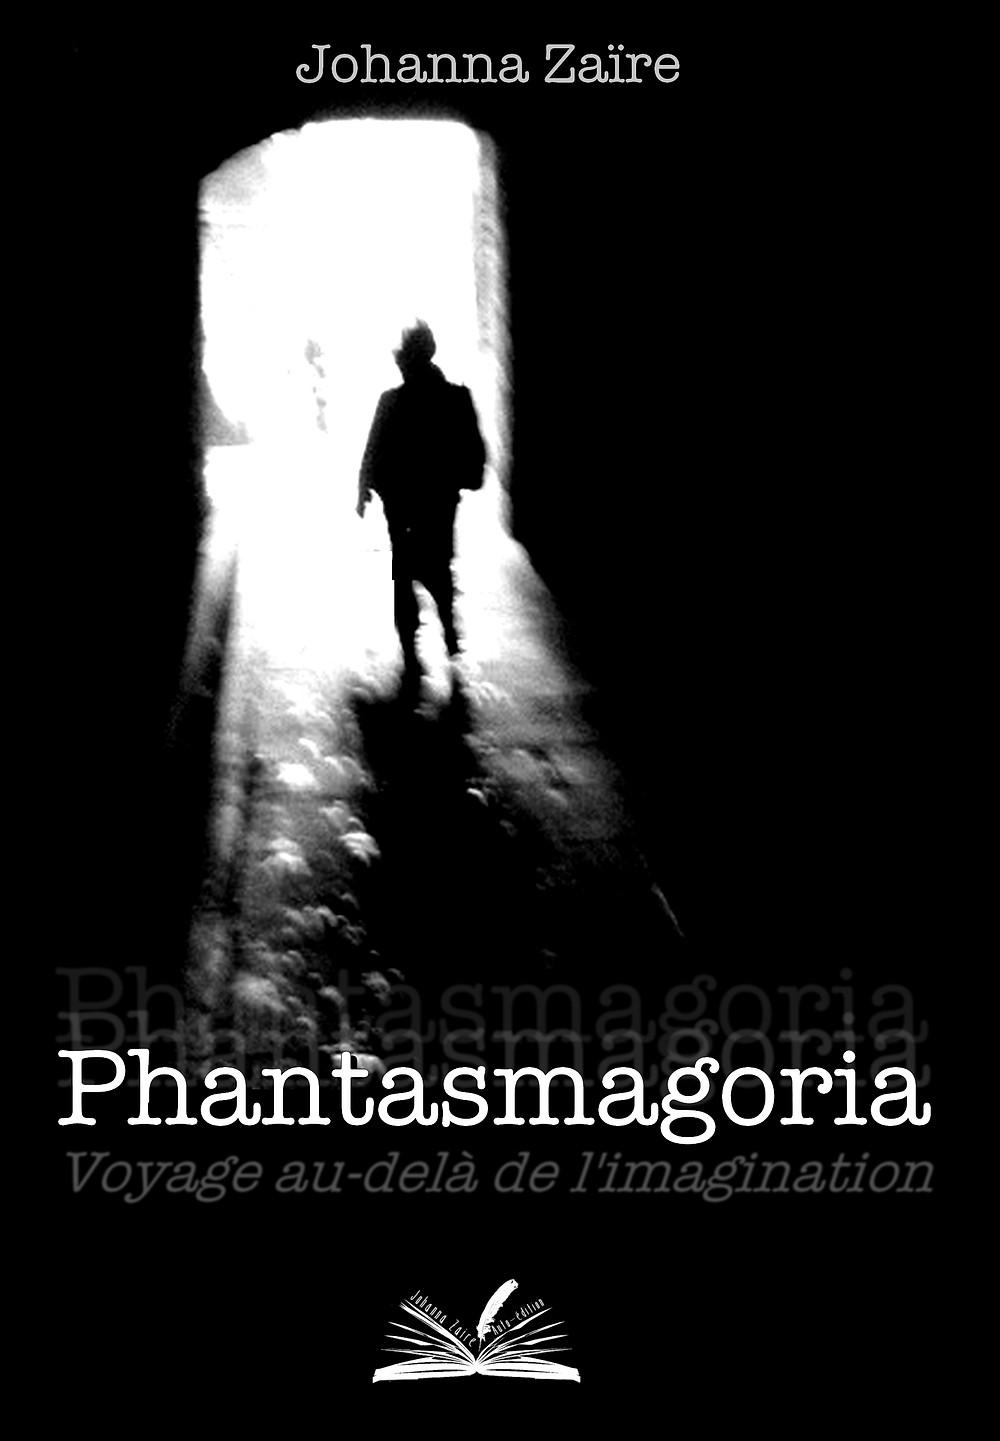 johanna, zaïre, phantasmagoria, recueil, nouvelles, polar, paranormal, thriller, roman, livre, auteur, français